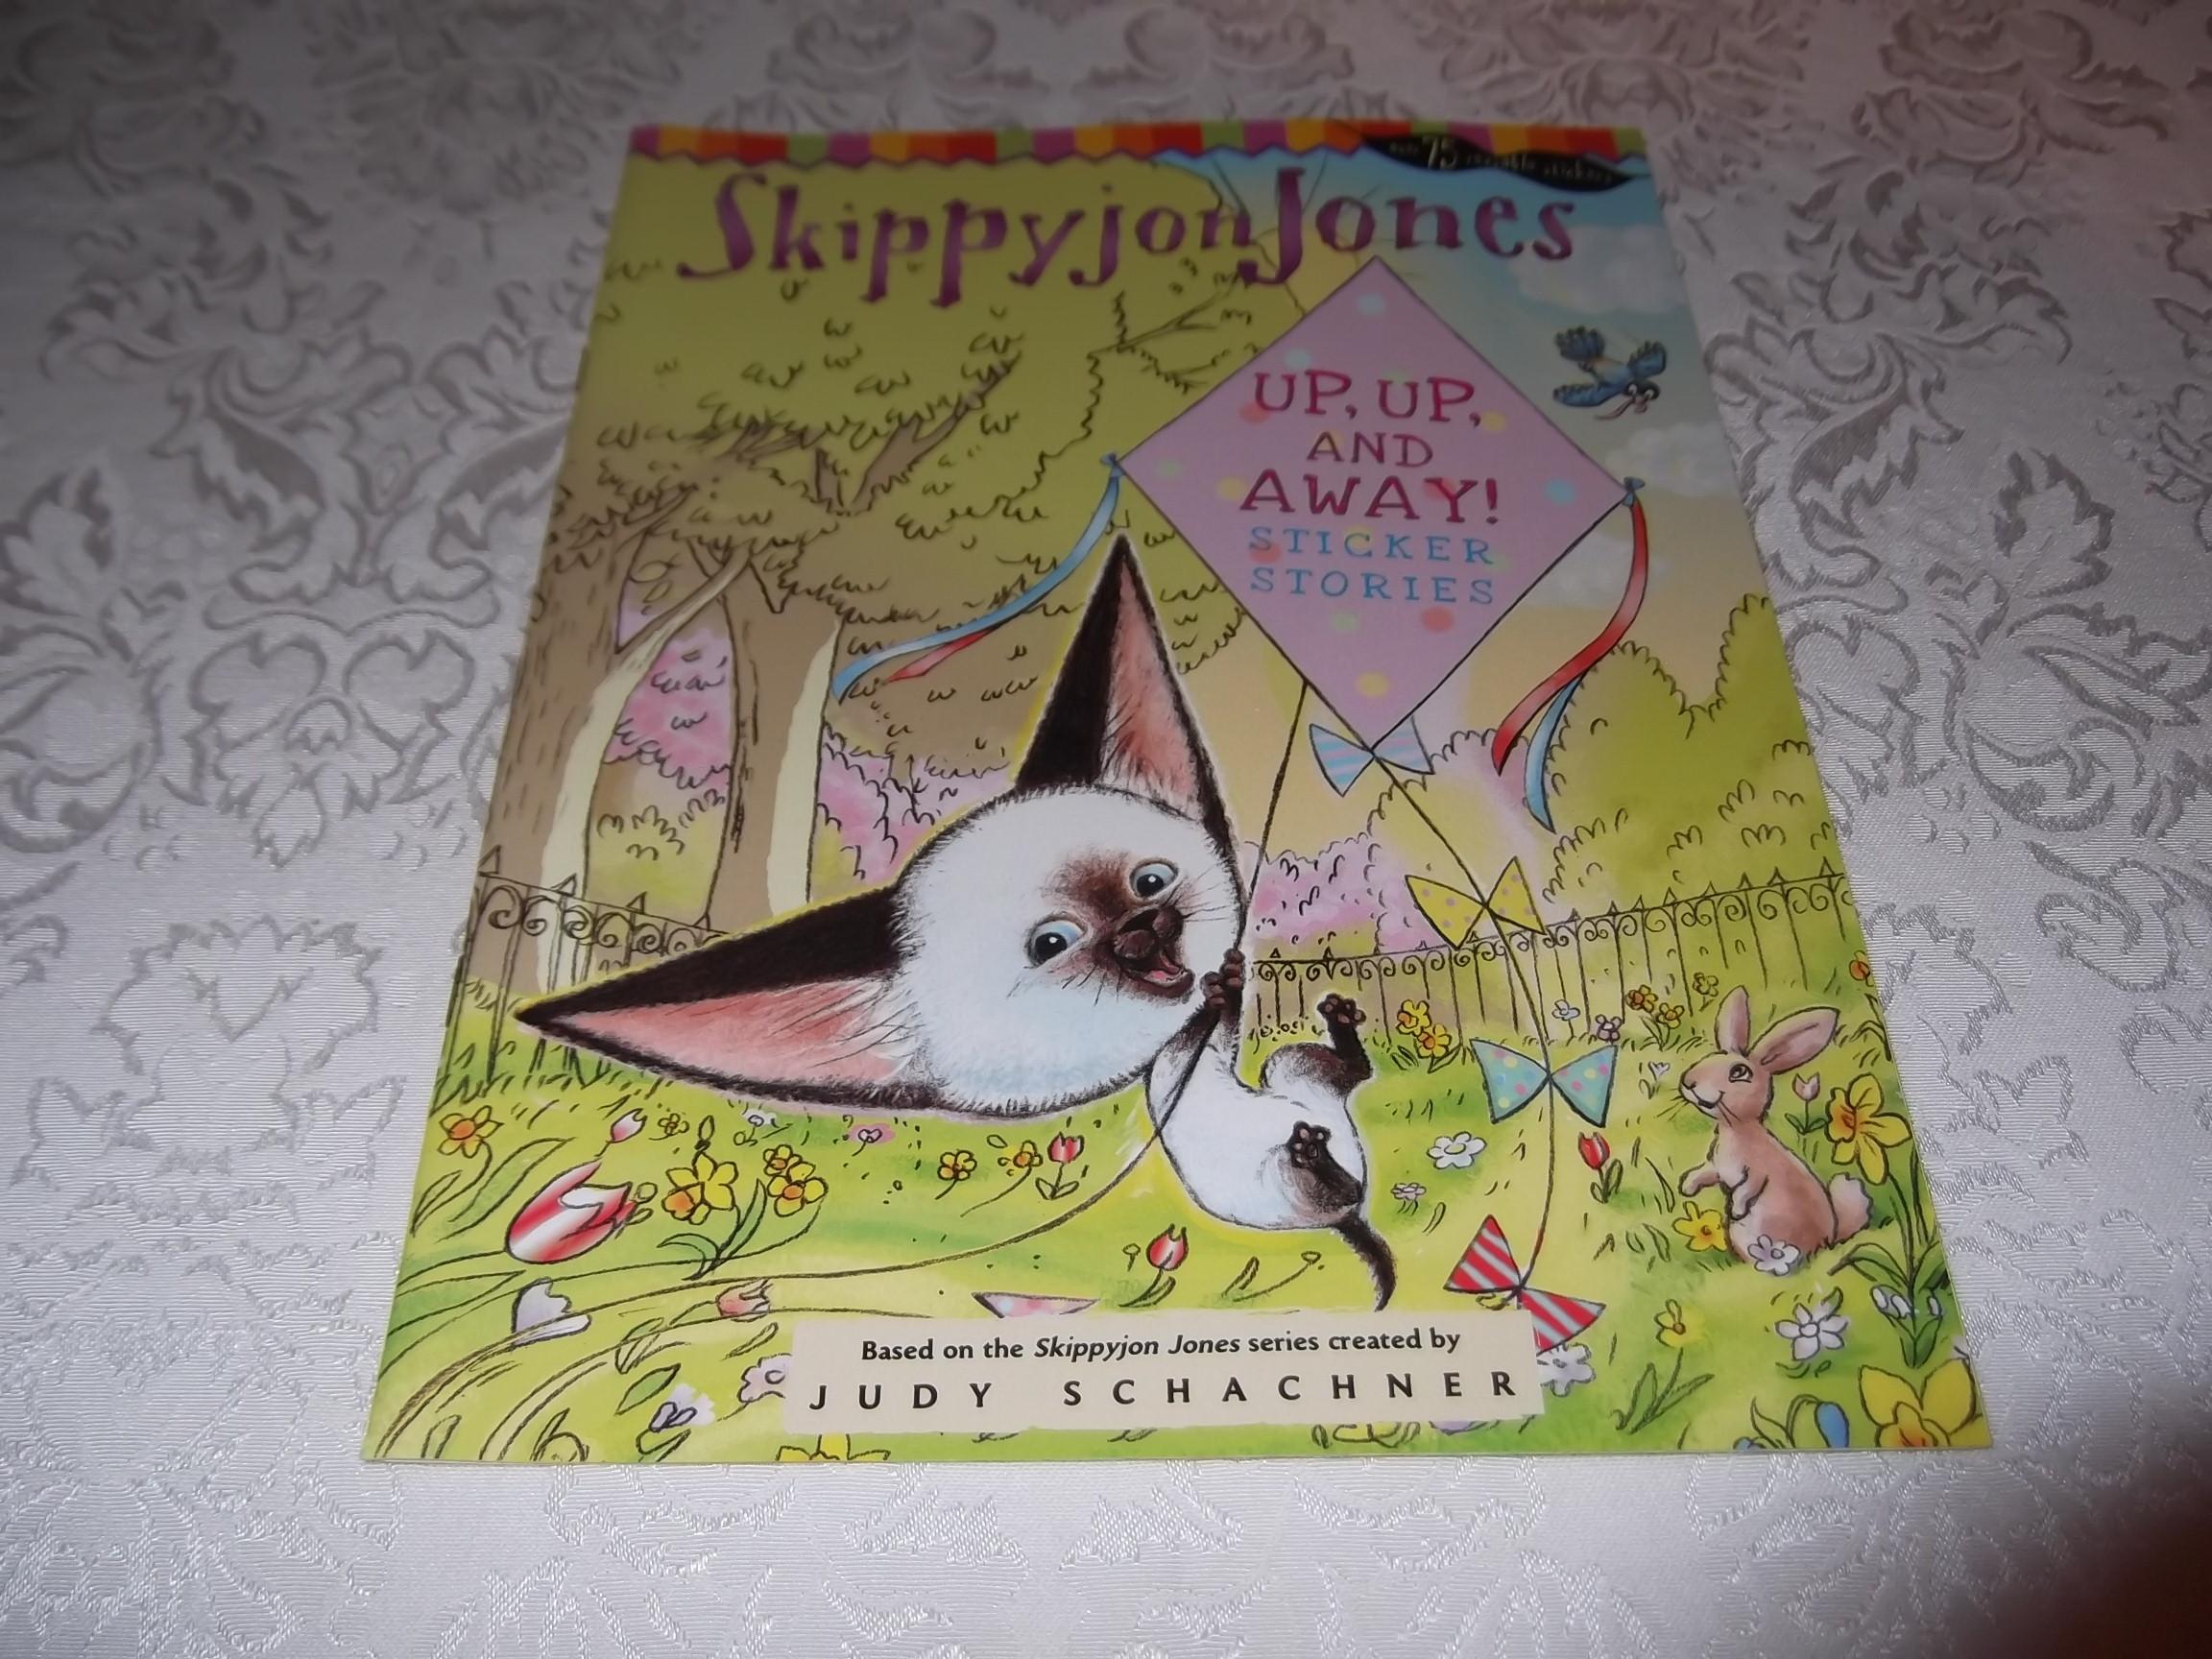 Skippyjon Jones Up, Up, And Away! Judy Schachner Sticker Stories brand new